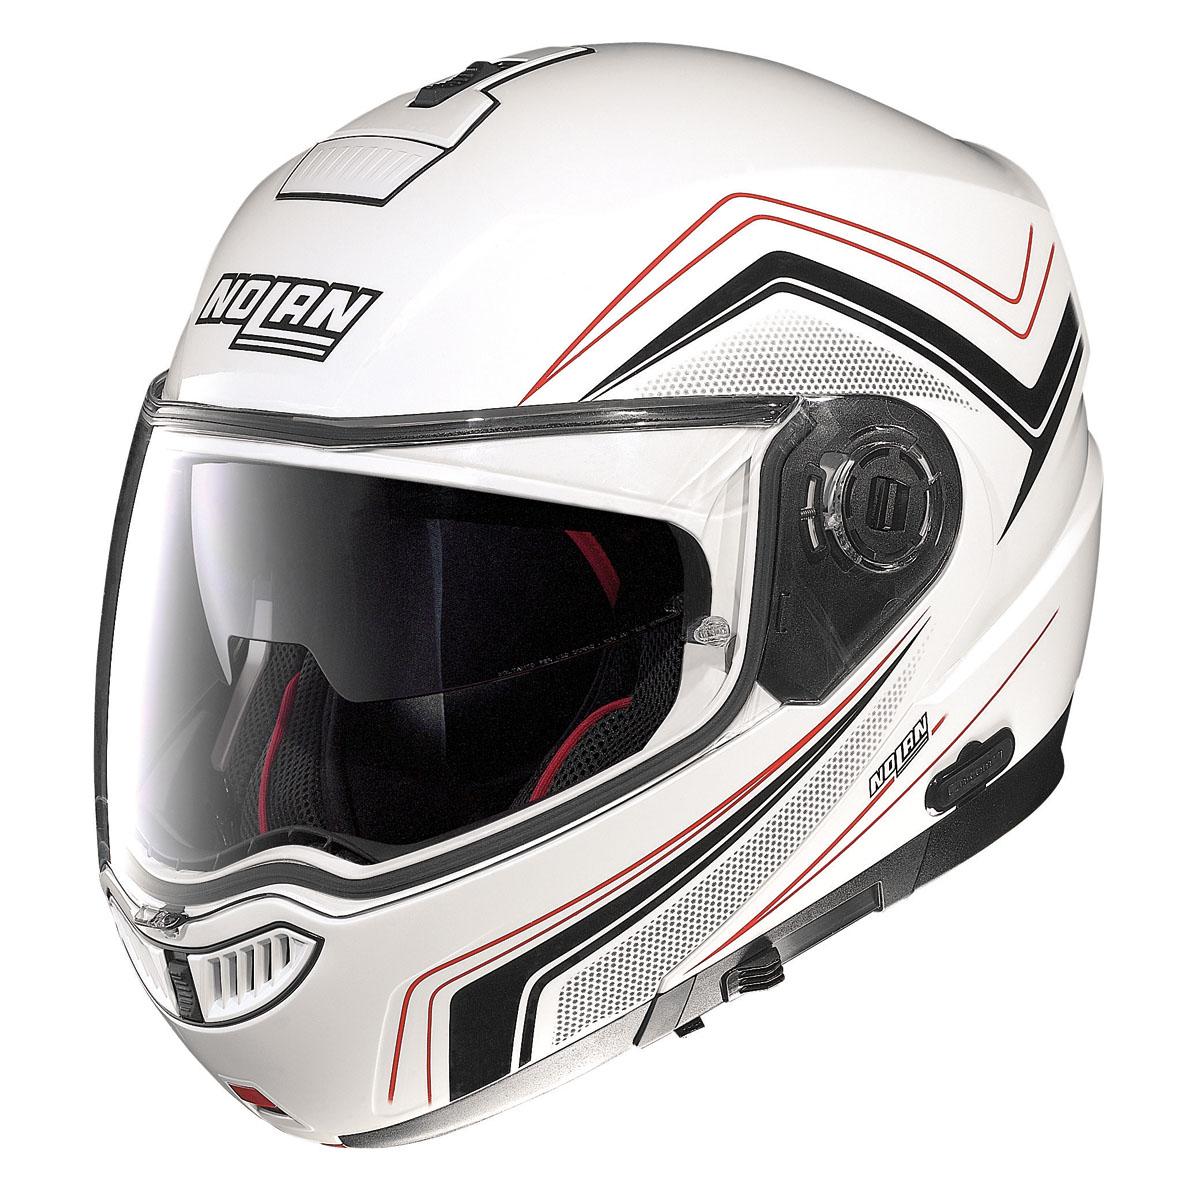 nolan helmet n104 absolute como n com 48 metal white. Black Bedroom Furniture Sets. Home Design Ideas